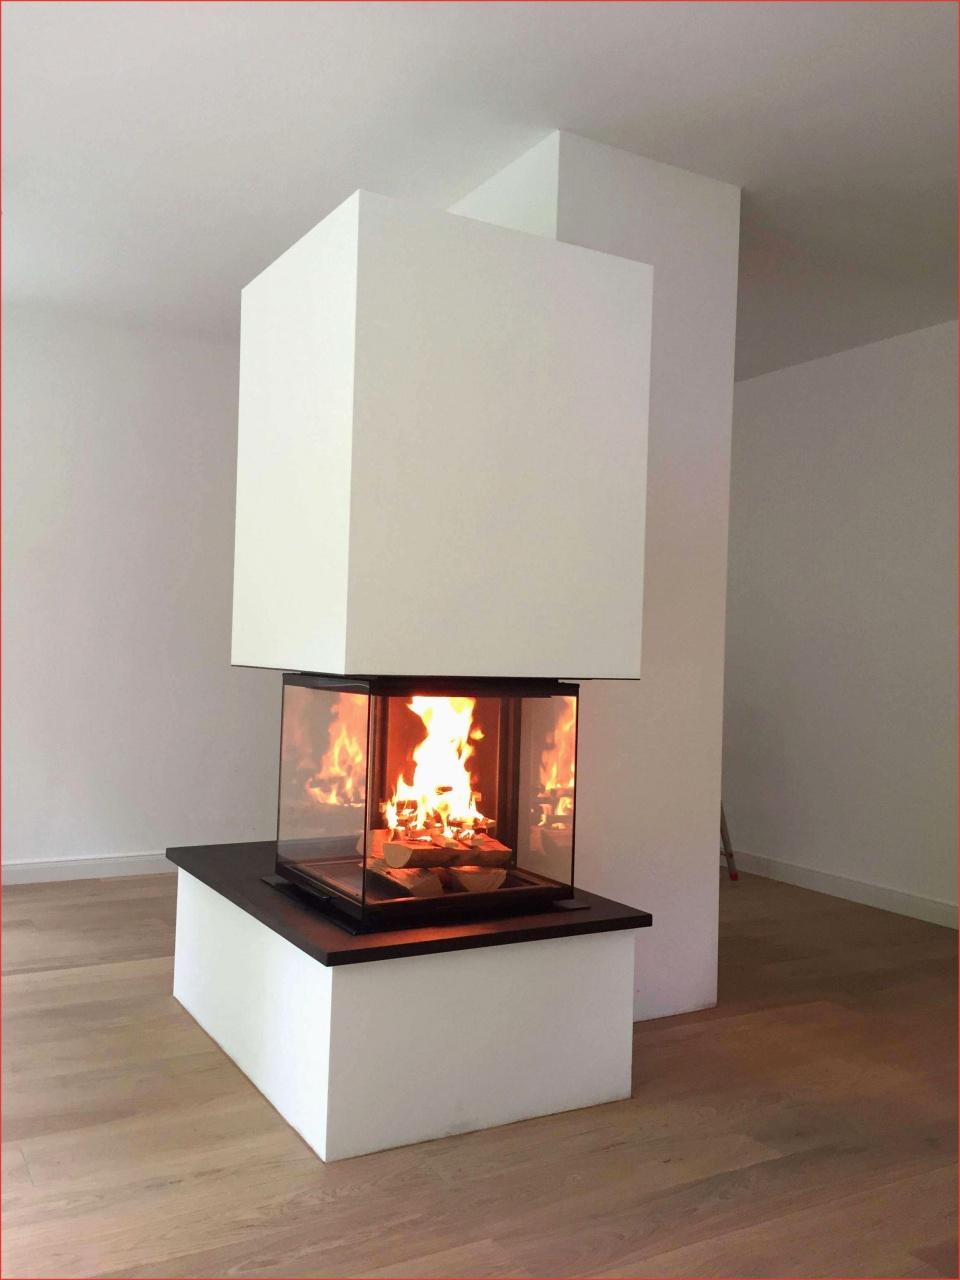 Full Size of Gas Fireplace Parts Ideas From Relaxliege Garten Bewässerung Automatisch Schaukelstuhl Rattanmöbel Spielhäuser Skulpturen Und Landschaftsbau Hamburg Garten Gaskamin Garten